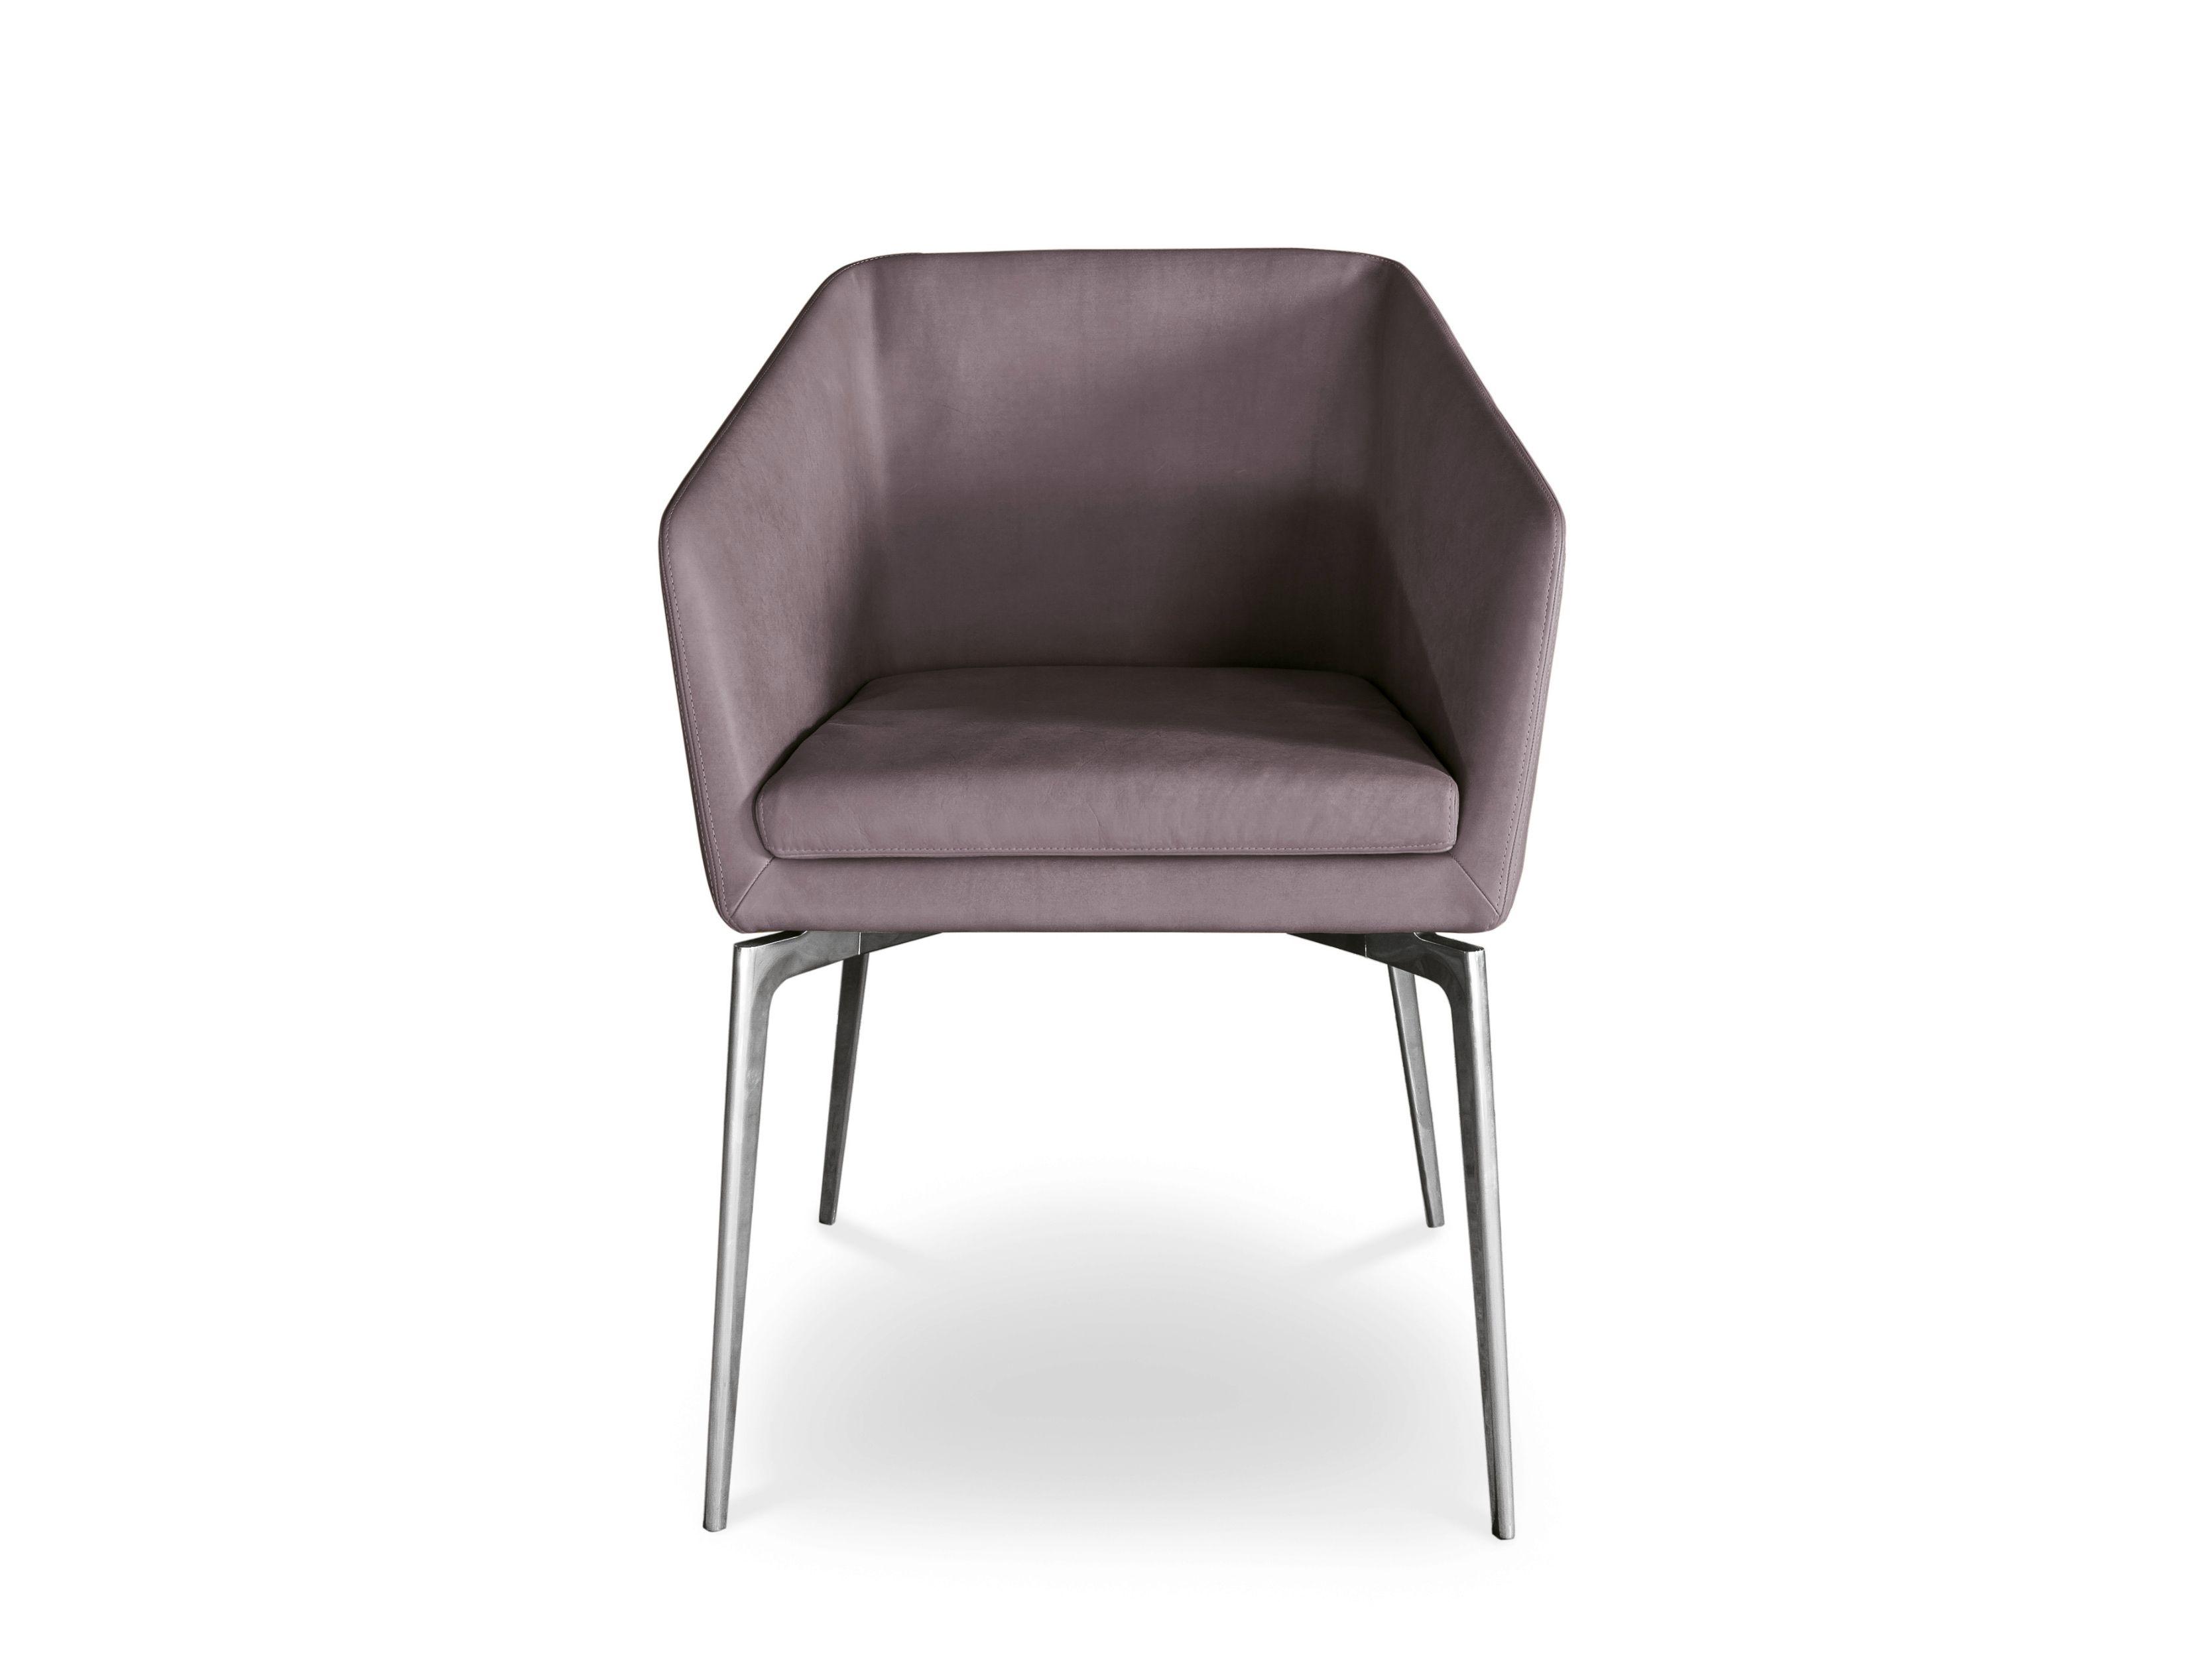 Sedie alivar ~ Upholstered leather easy chair with armrests denise by alivar